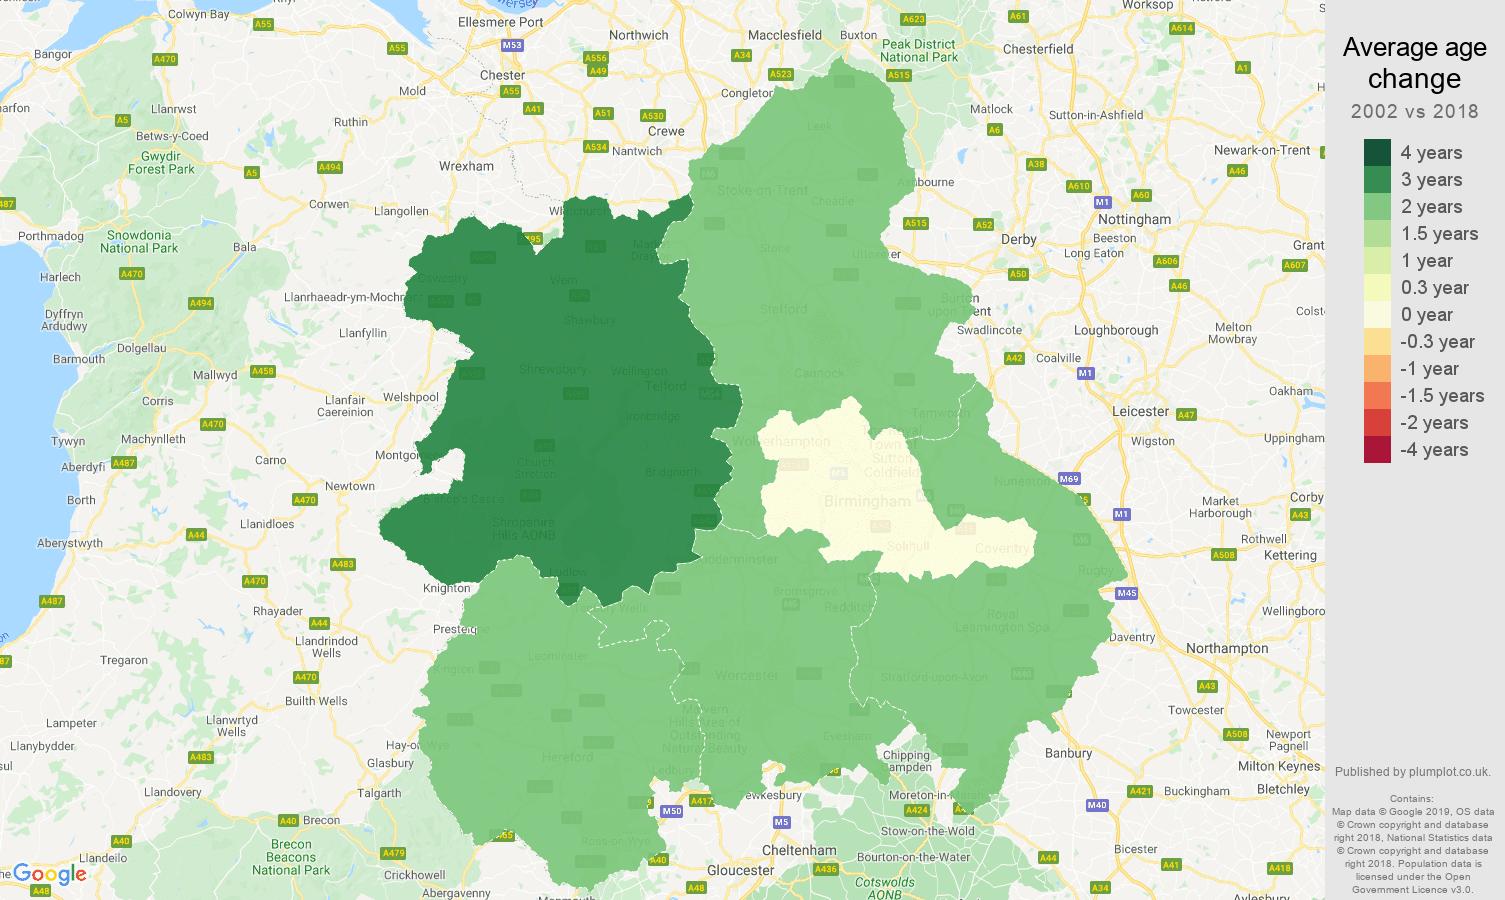 West Midlands average age change map